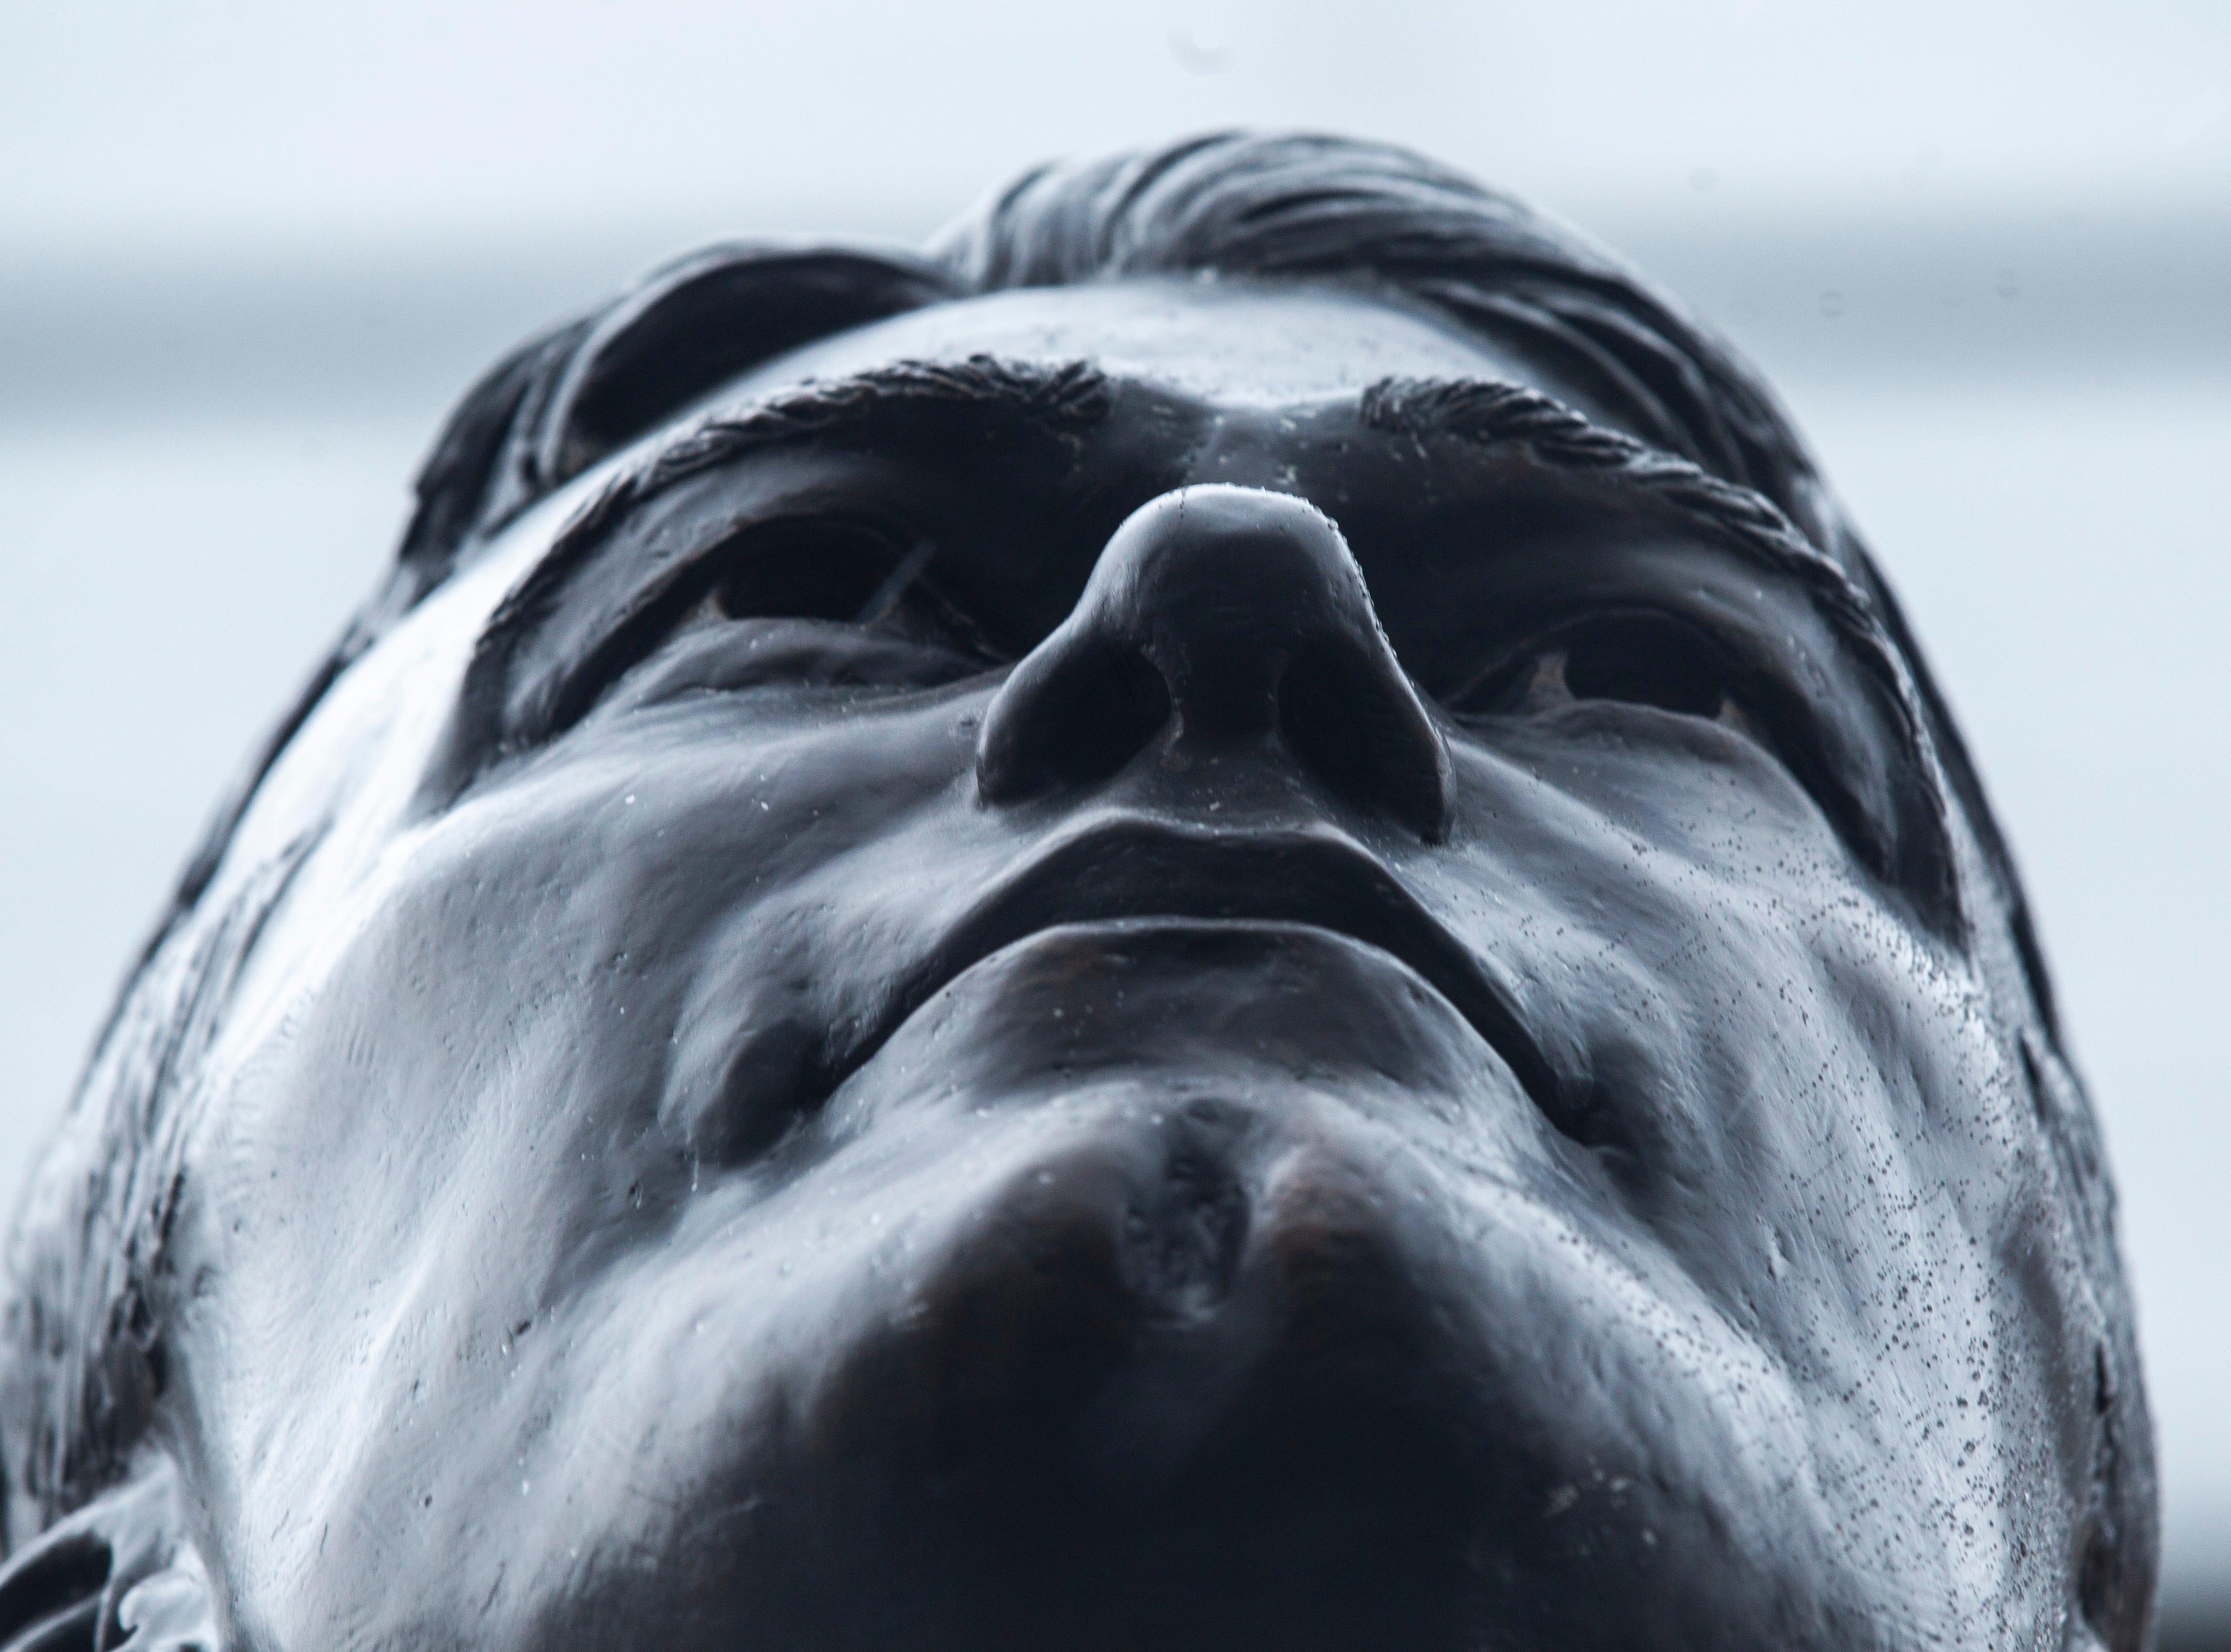 Freezing rain falls on a statue of Nile Kinnick, Tuesday, Feb. 5, 2019, in Iowa City, Iowa.